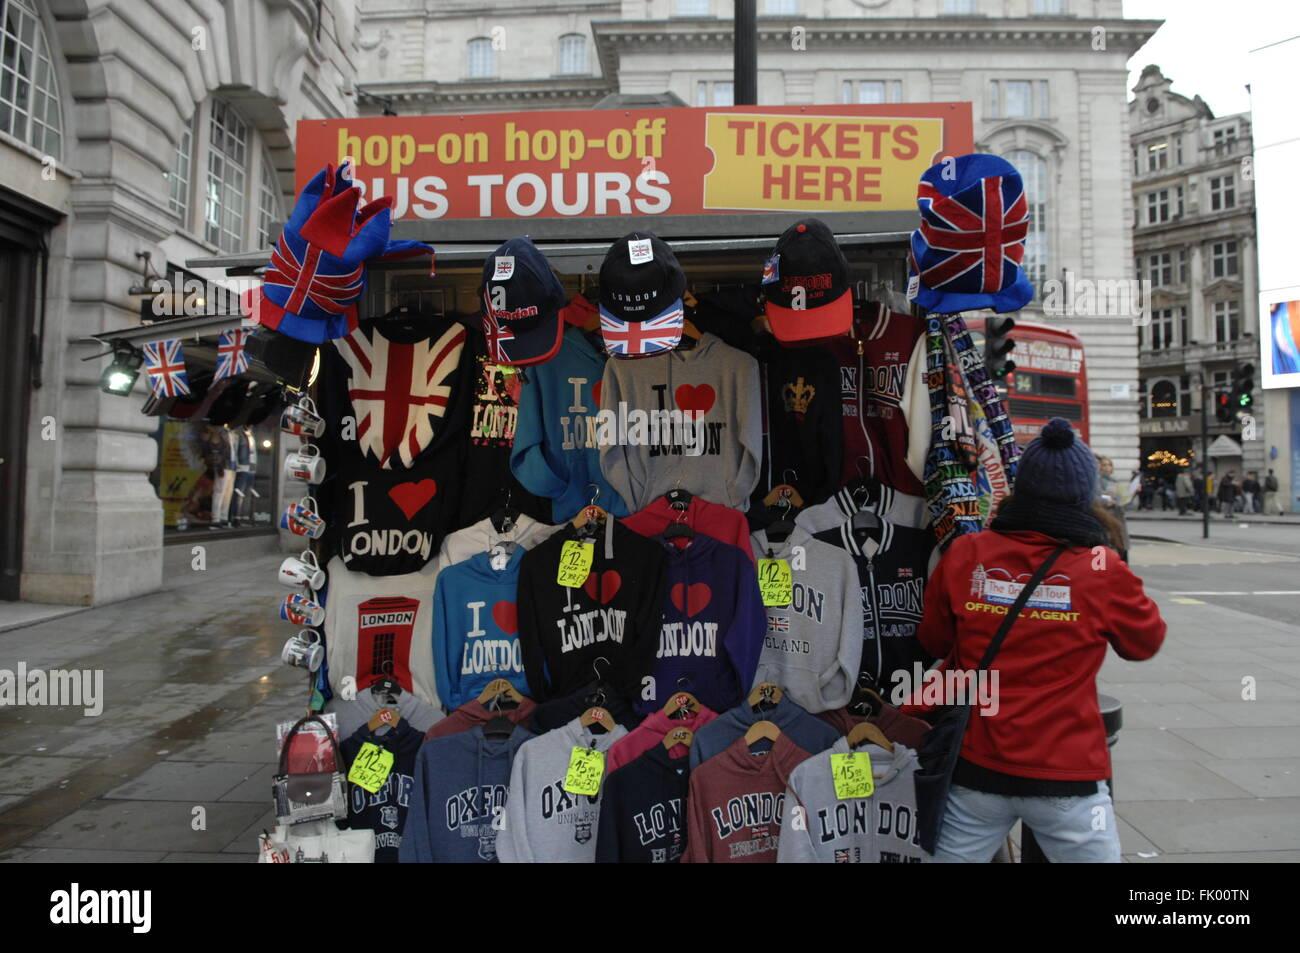 I Love London Tee-shirts seller,Piccadilly Circus,London,UK - Stock Image